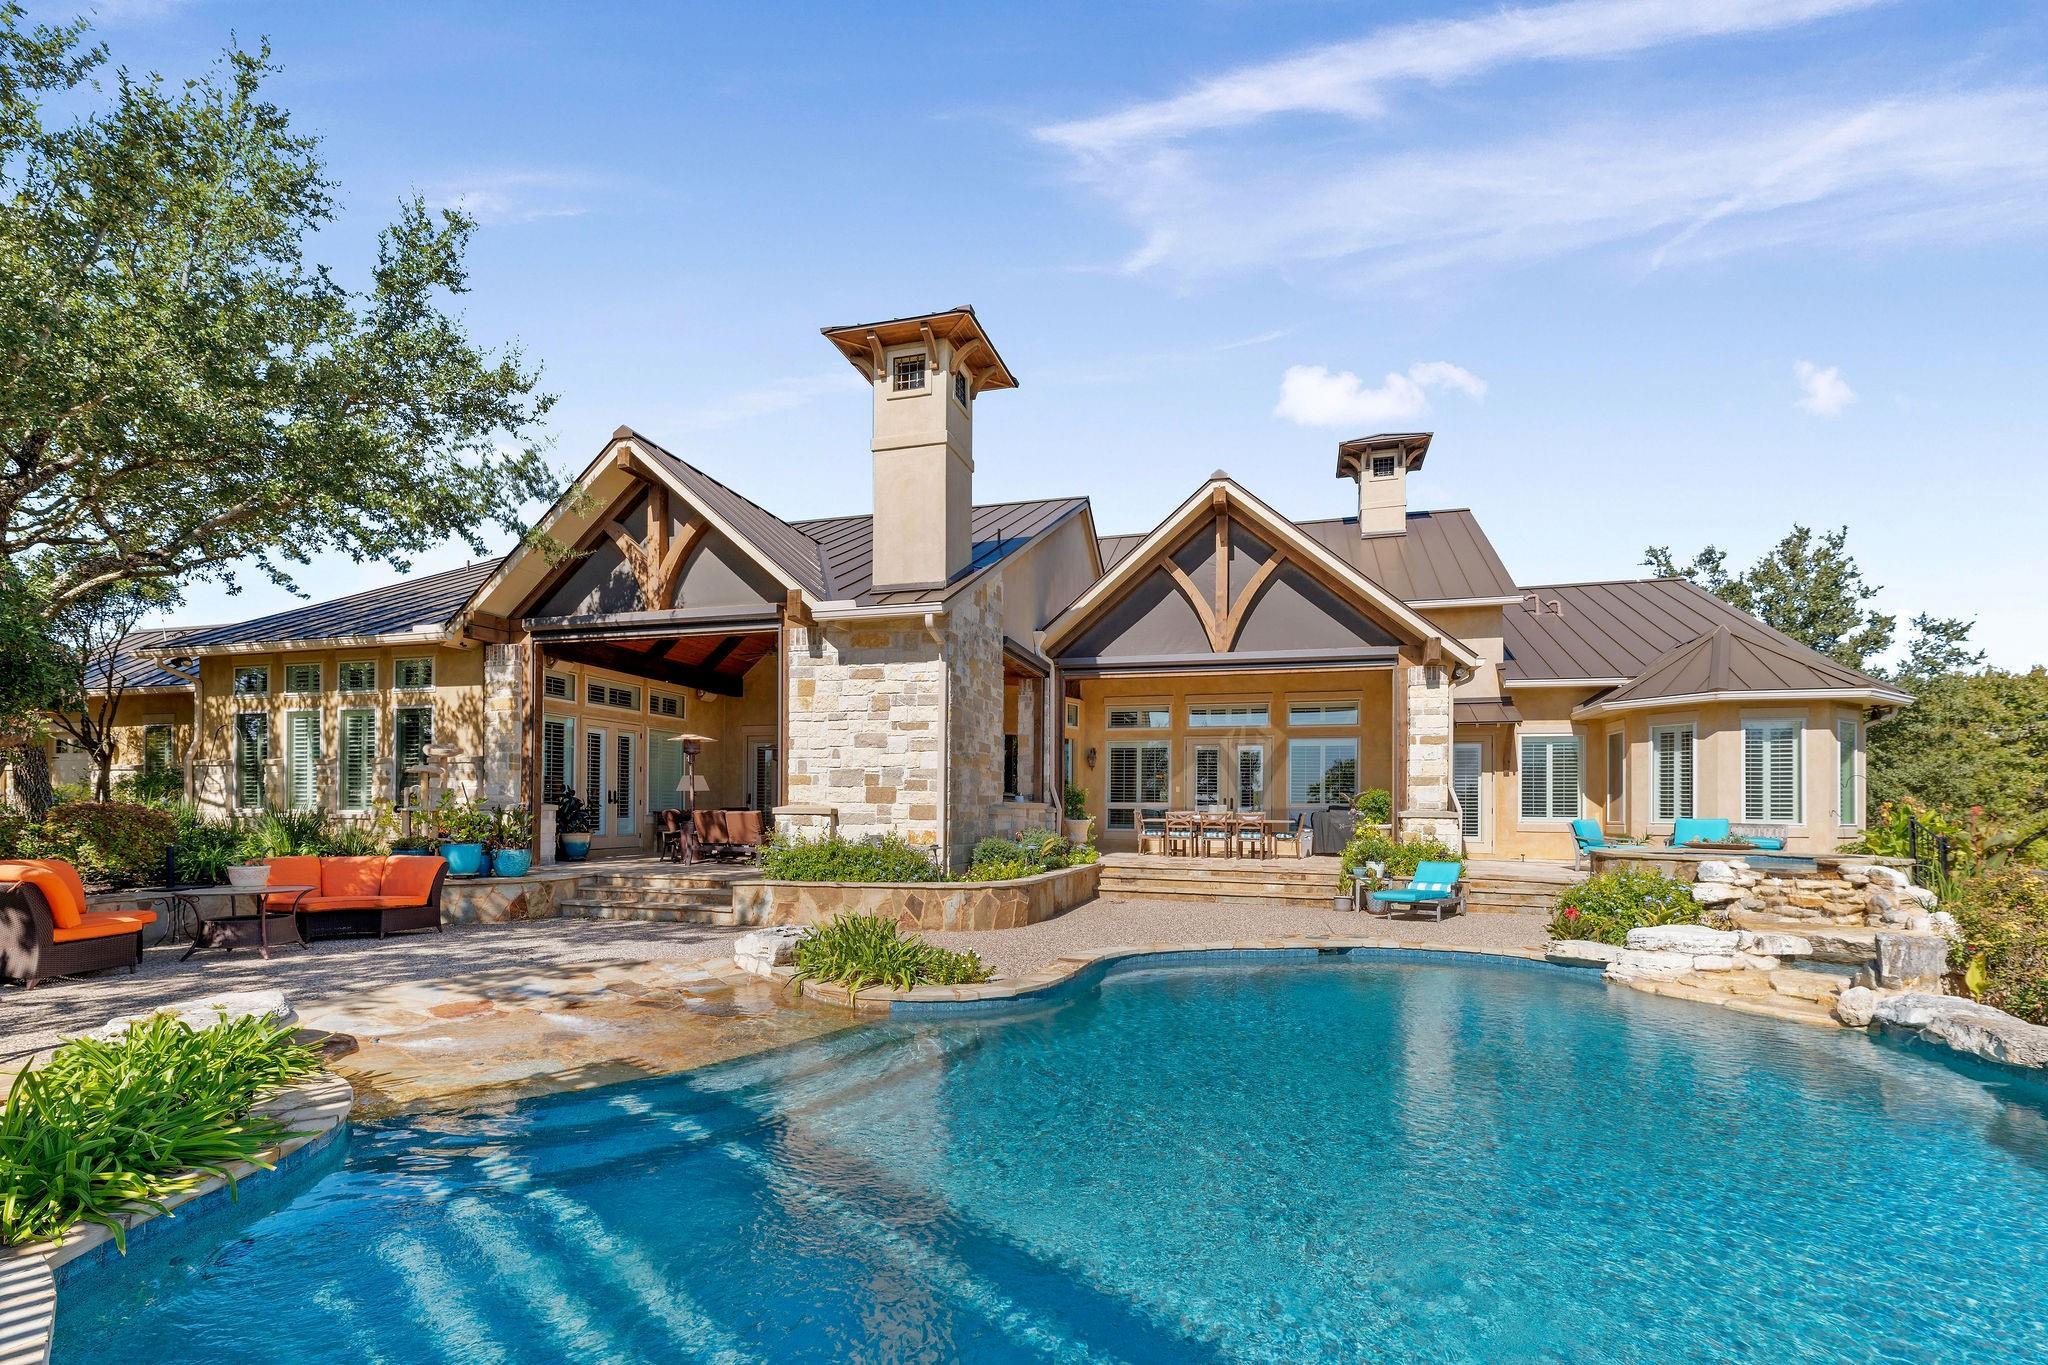 78006 Real Estate Listings Main Image